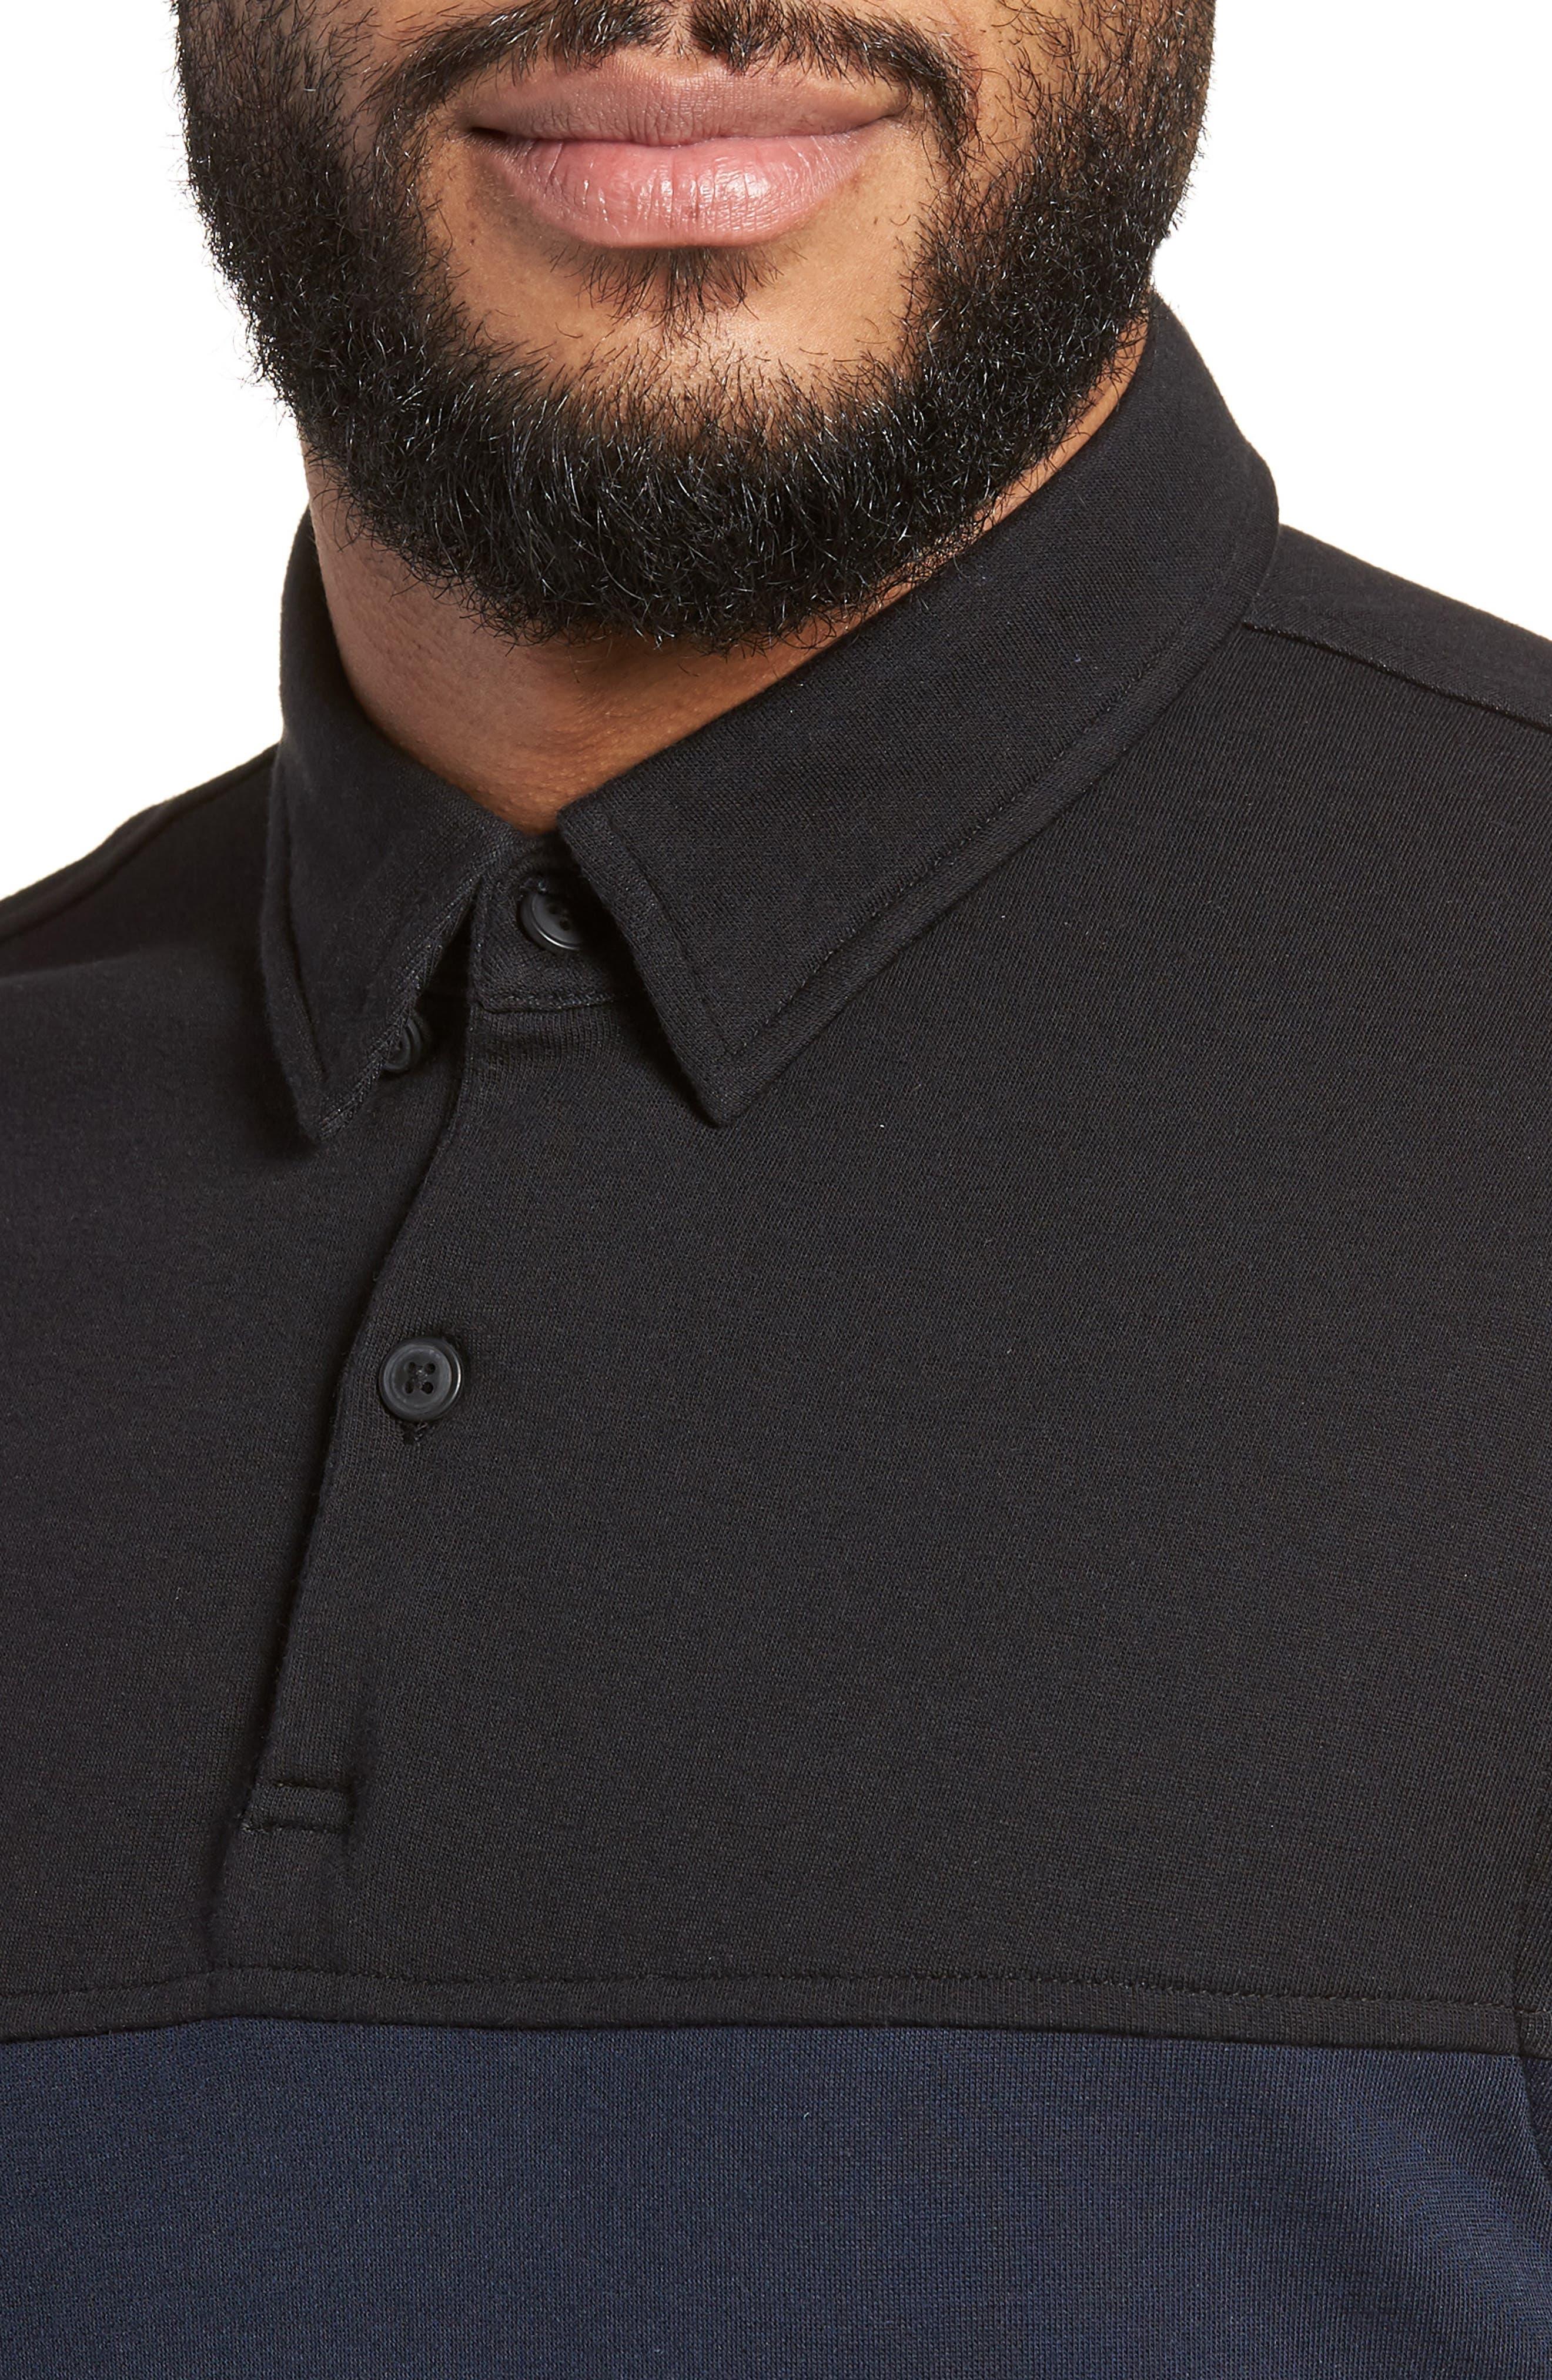 Trim Fit Colorblock Short Sleeve Polo,                             Alternate thumbnail 4, color,                             Navy Black